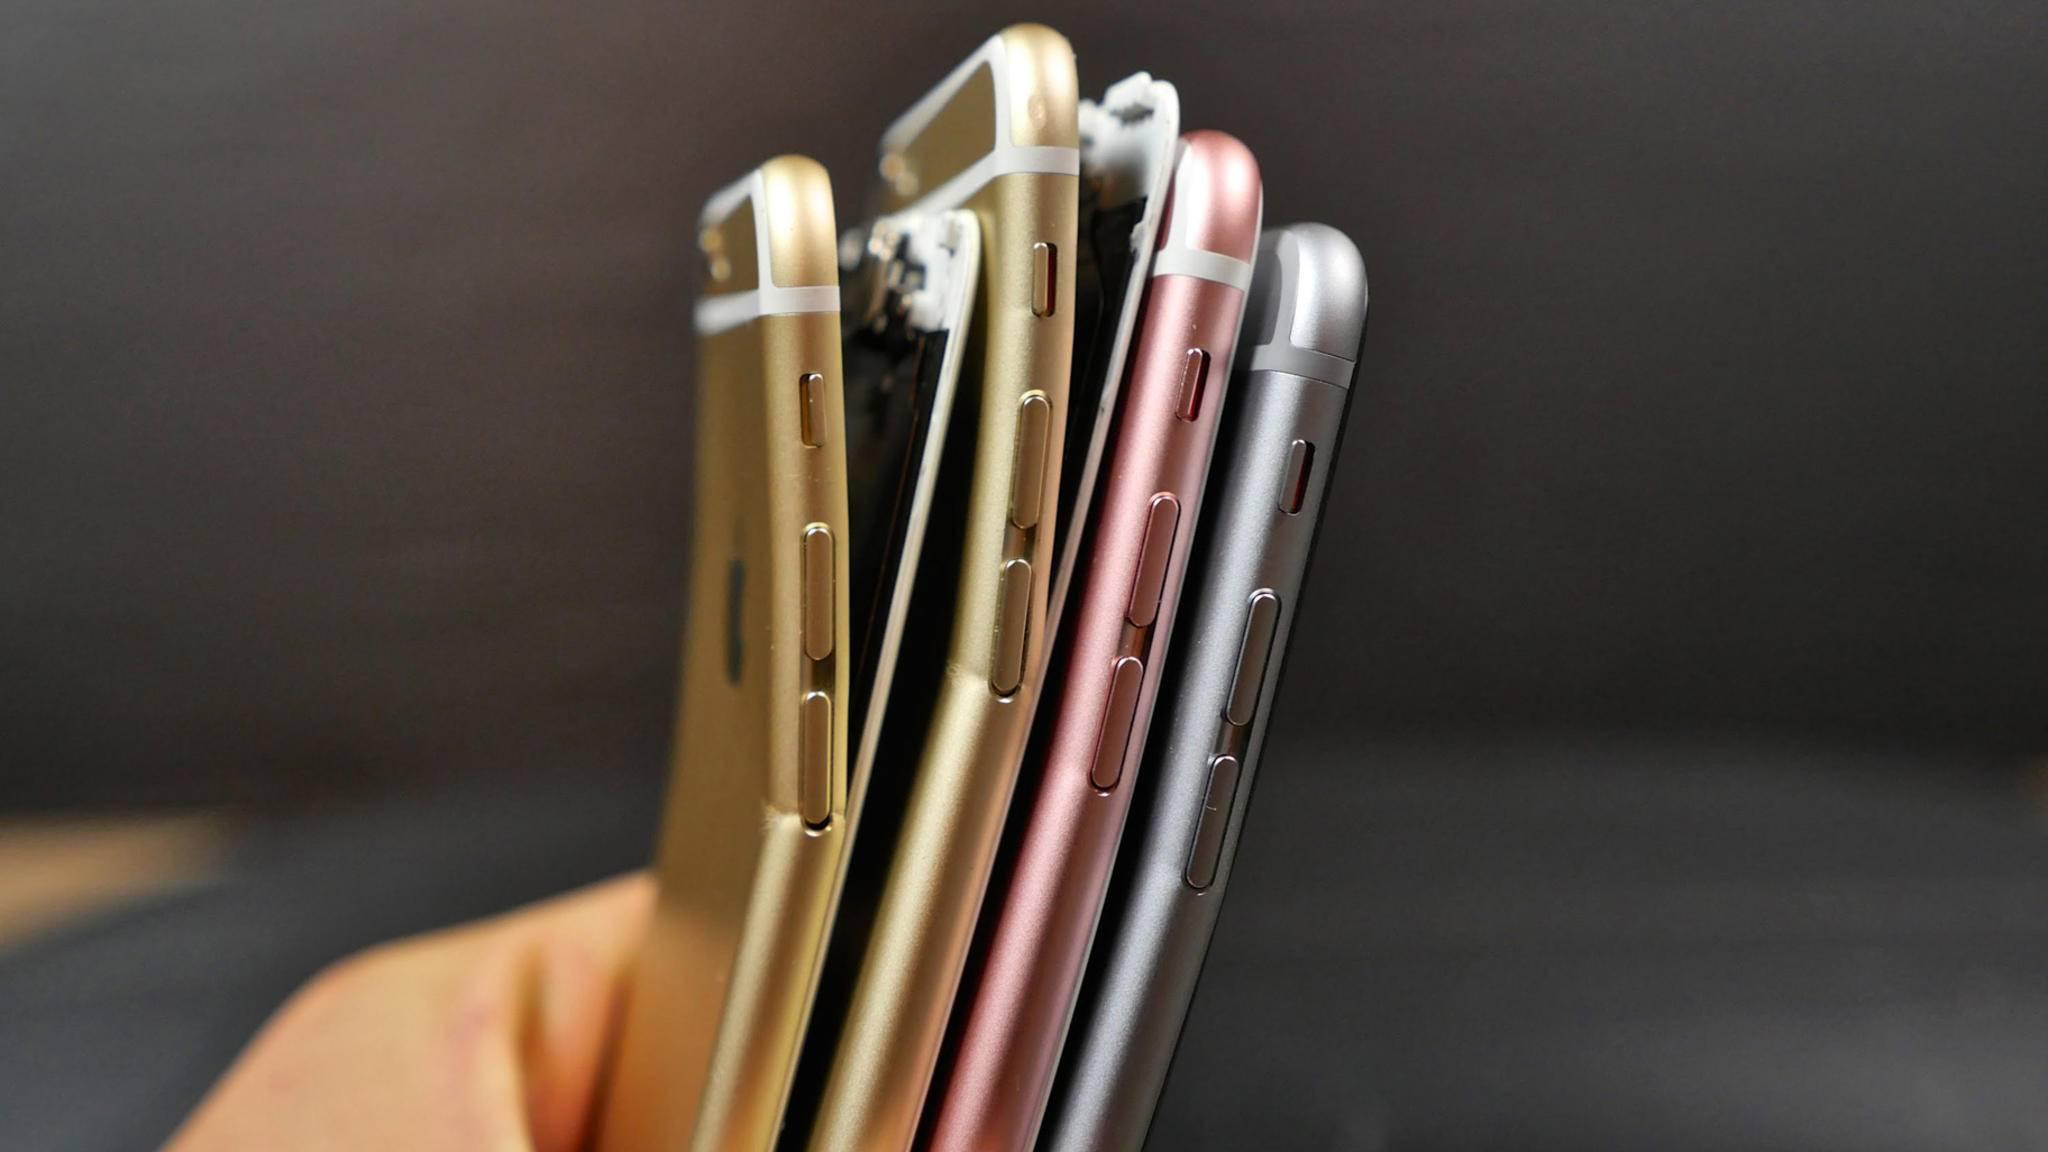 Dass sich das iPhone 6 leicht biegen lässt, wusste Apple offenbar schon Monate vor dem Release.